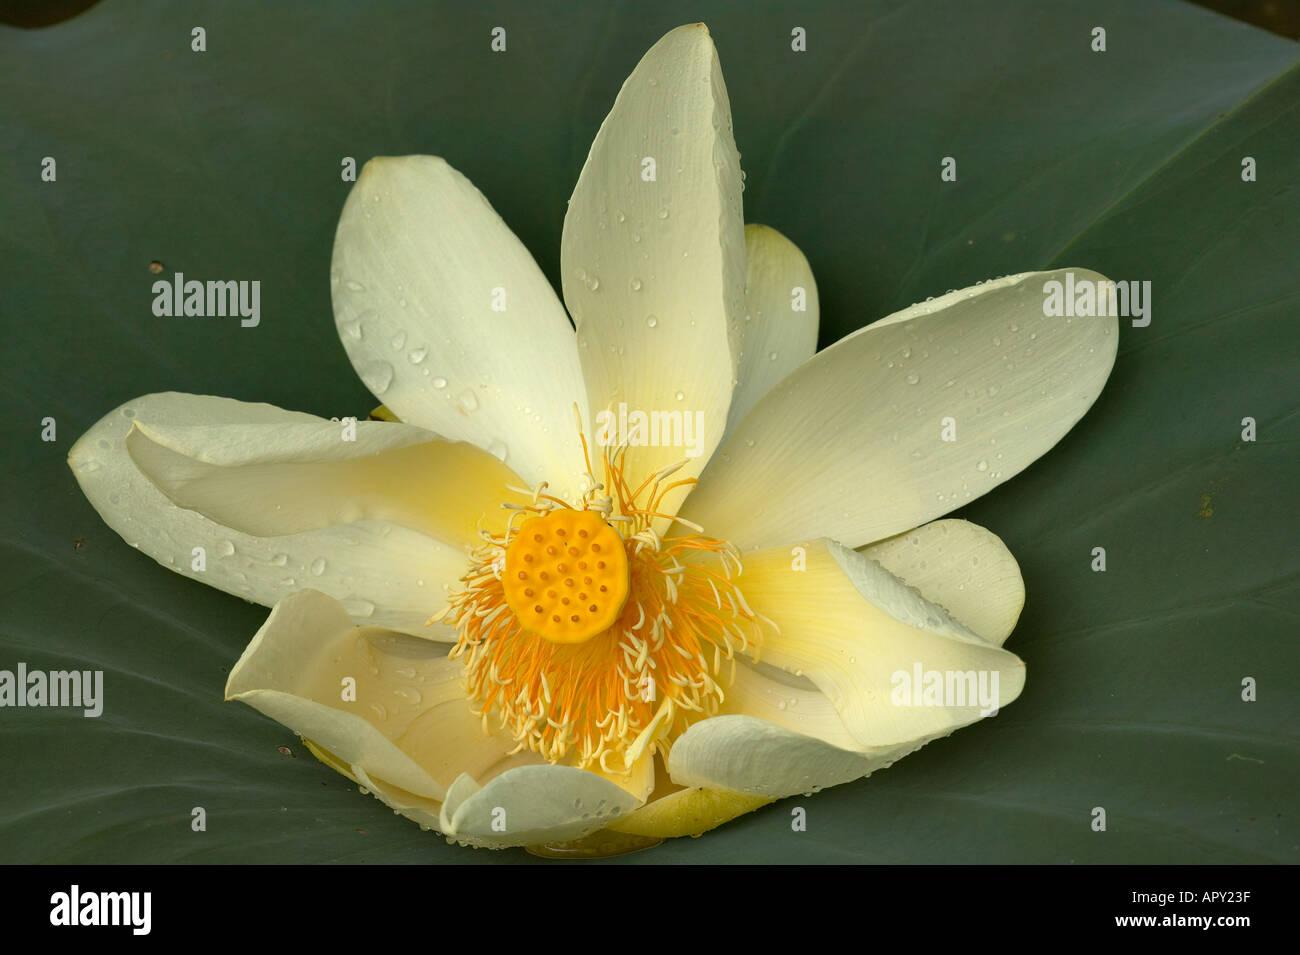 American Lotus Flower Stock Photos American Lotus Flower Stock